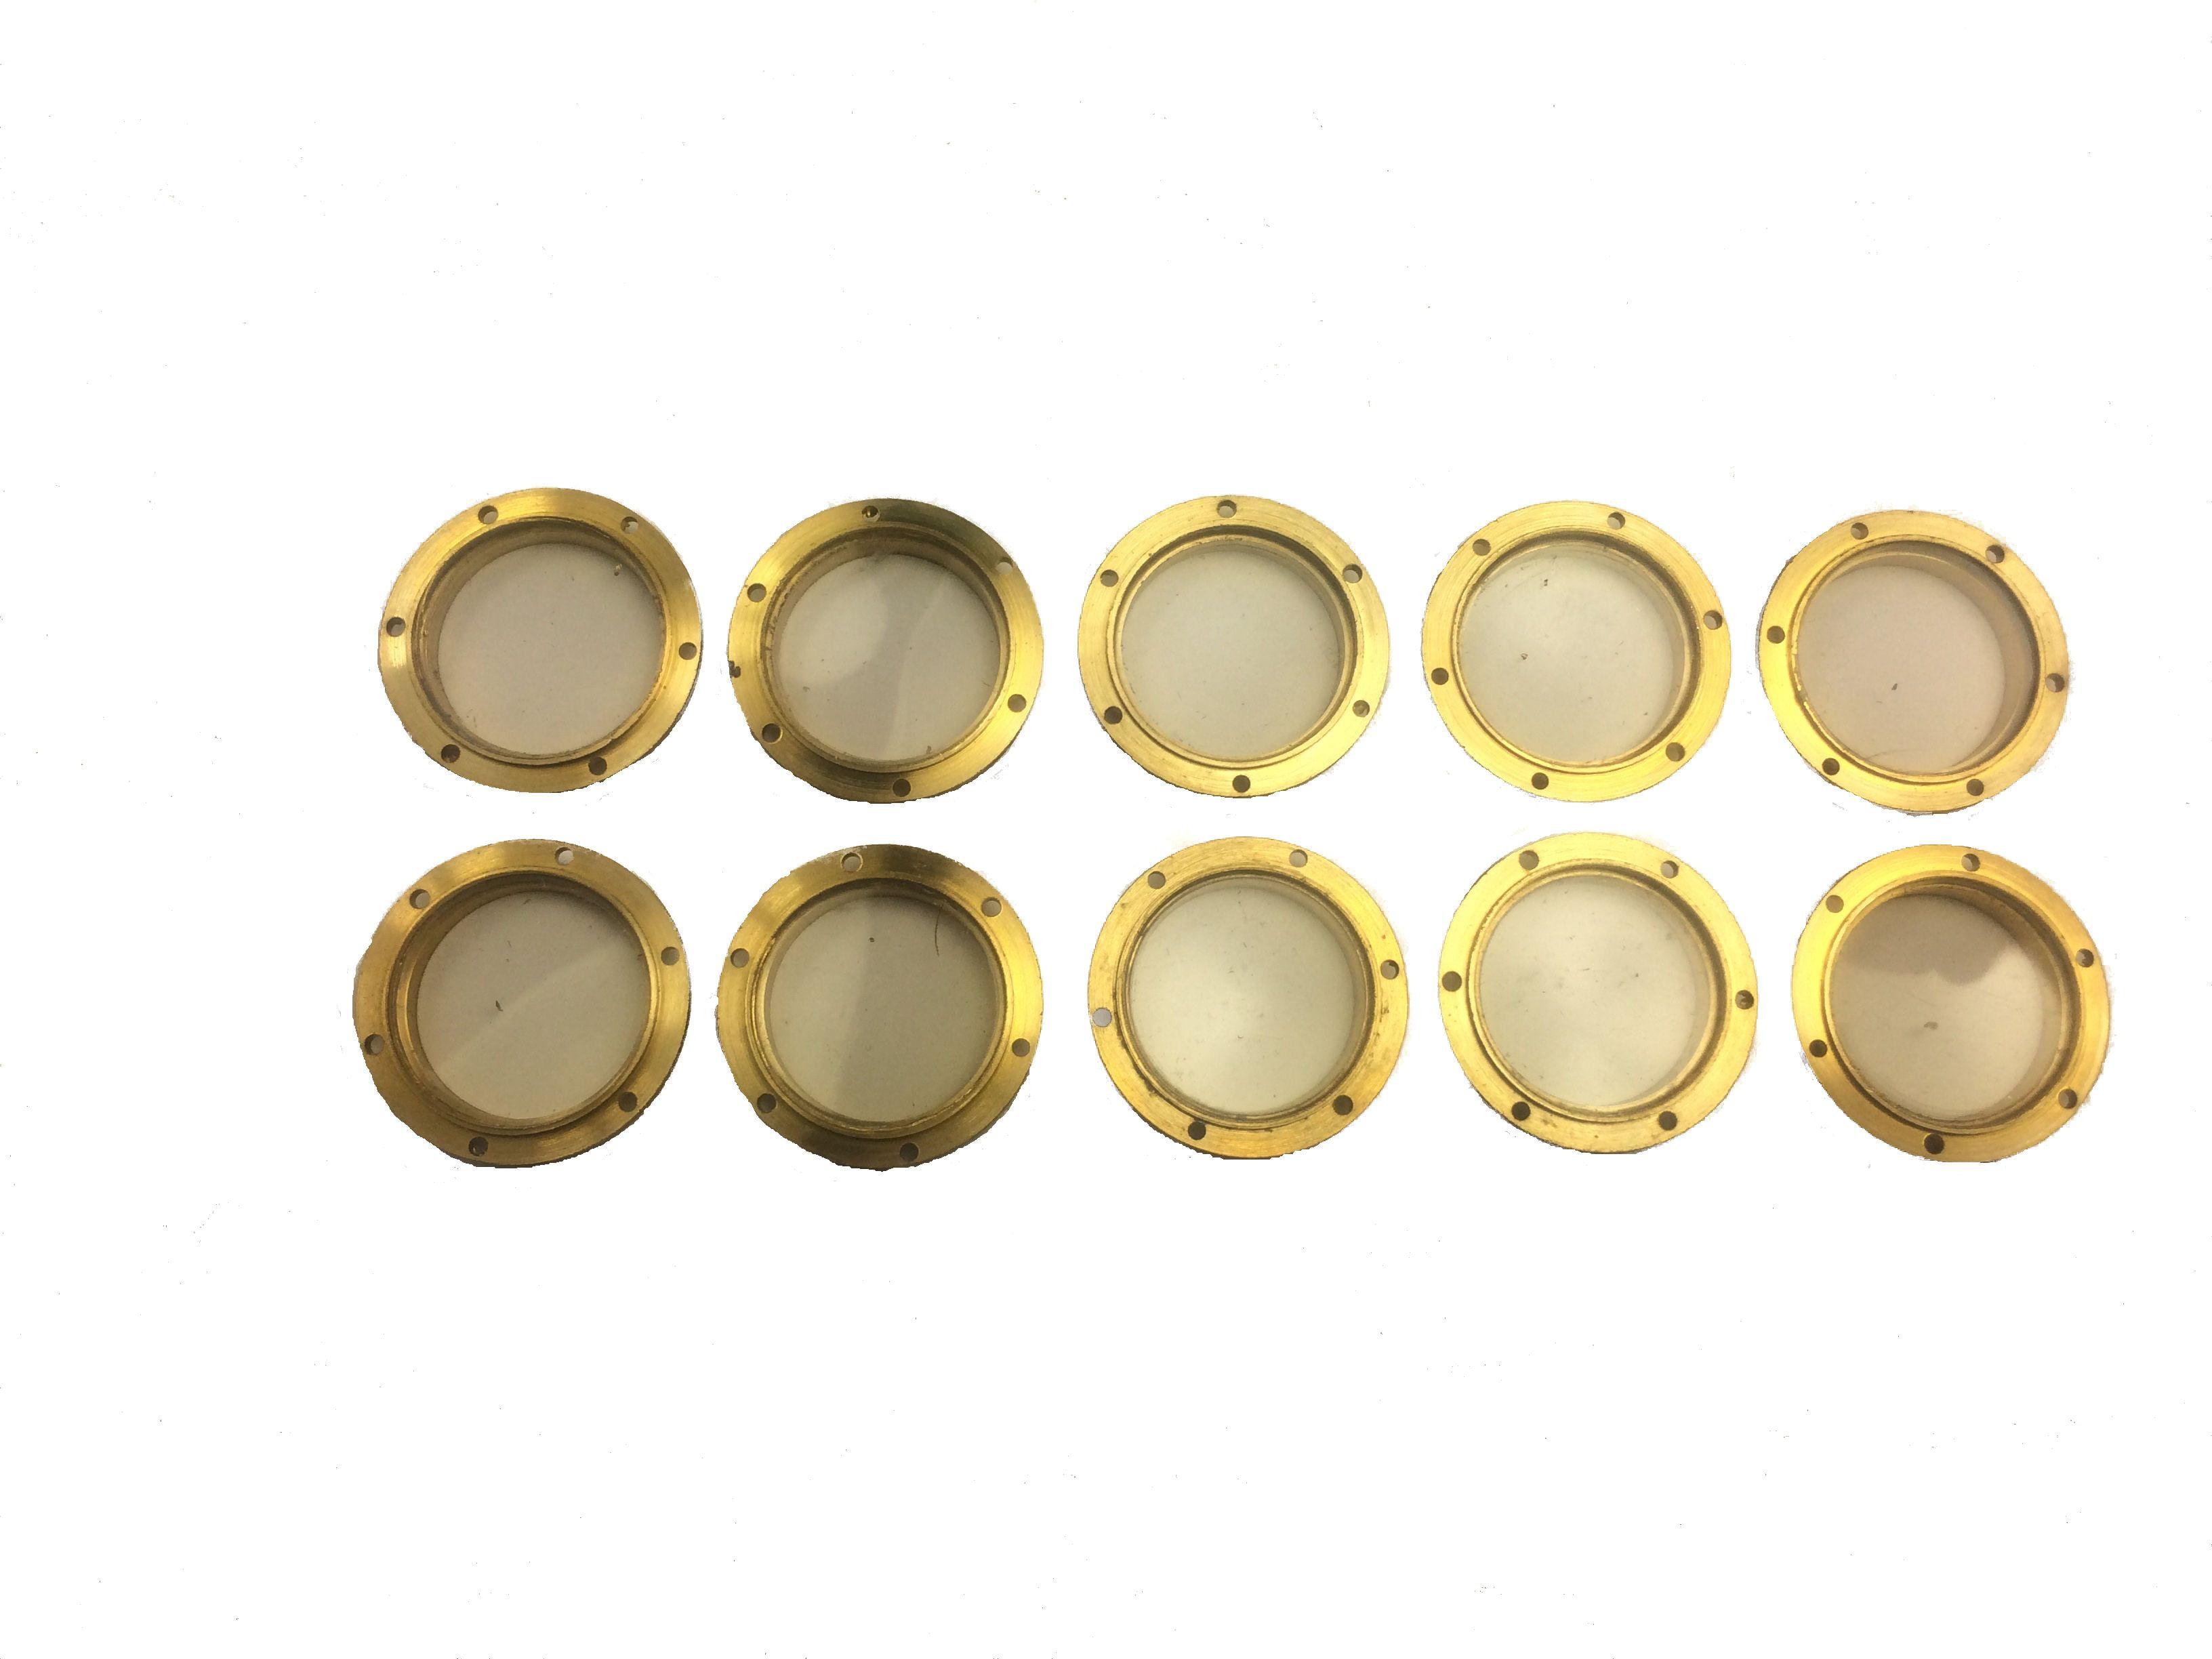 Caldercraft Brass Flanged Glazed Portholes (10) - 8mm Caldercraft Portholes